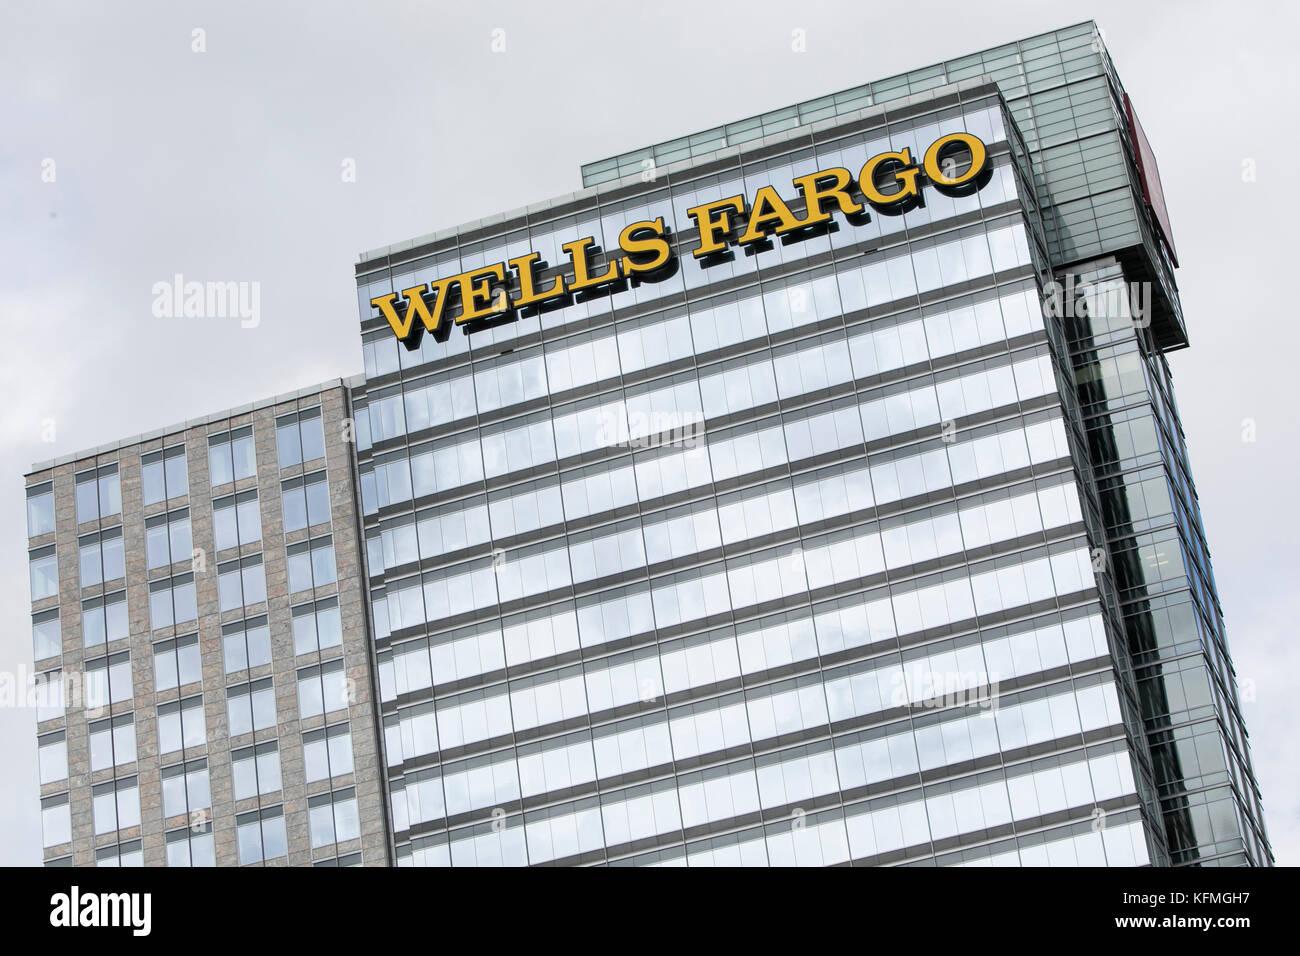 Fancy Wiring Money Wells Fargo Sketch - The Wire - magnox.info